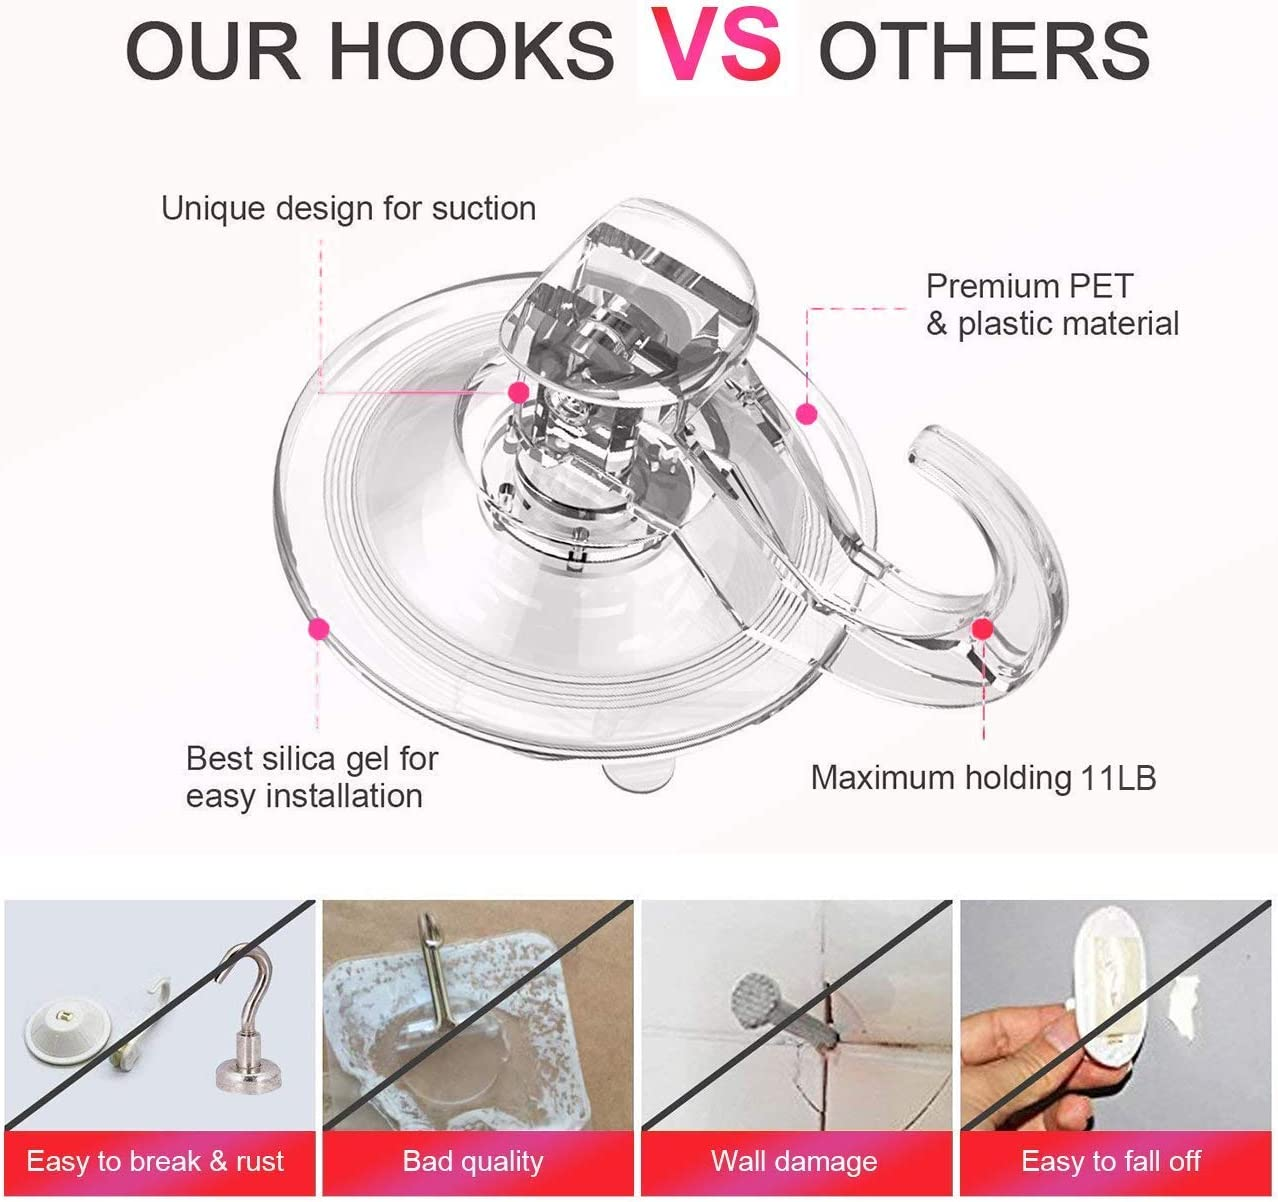 Elegear Ganchos Super Fuerte pl/ástico succi/ón Ultra Resistente Gancho Ventosa para el hogar Perchas 3 Pack Suction Hooks/ 3 Pack